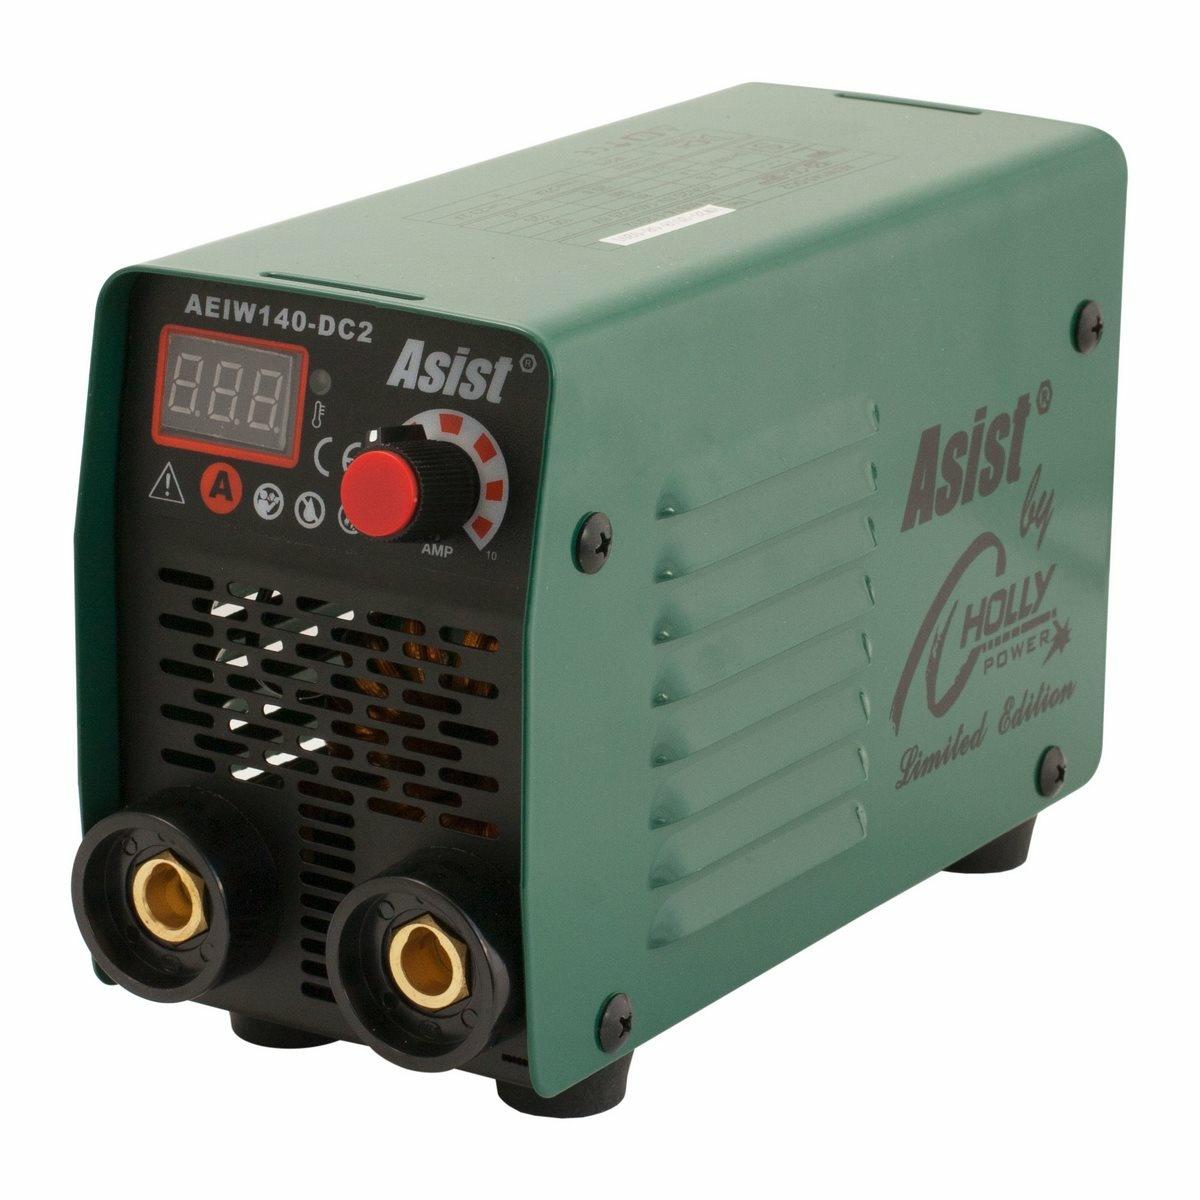 Asist AEIW140-DC2 Svářecí invertor, 140 A